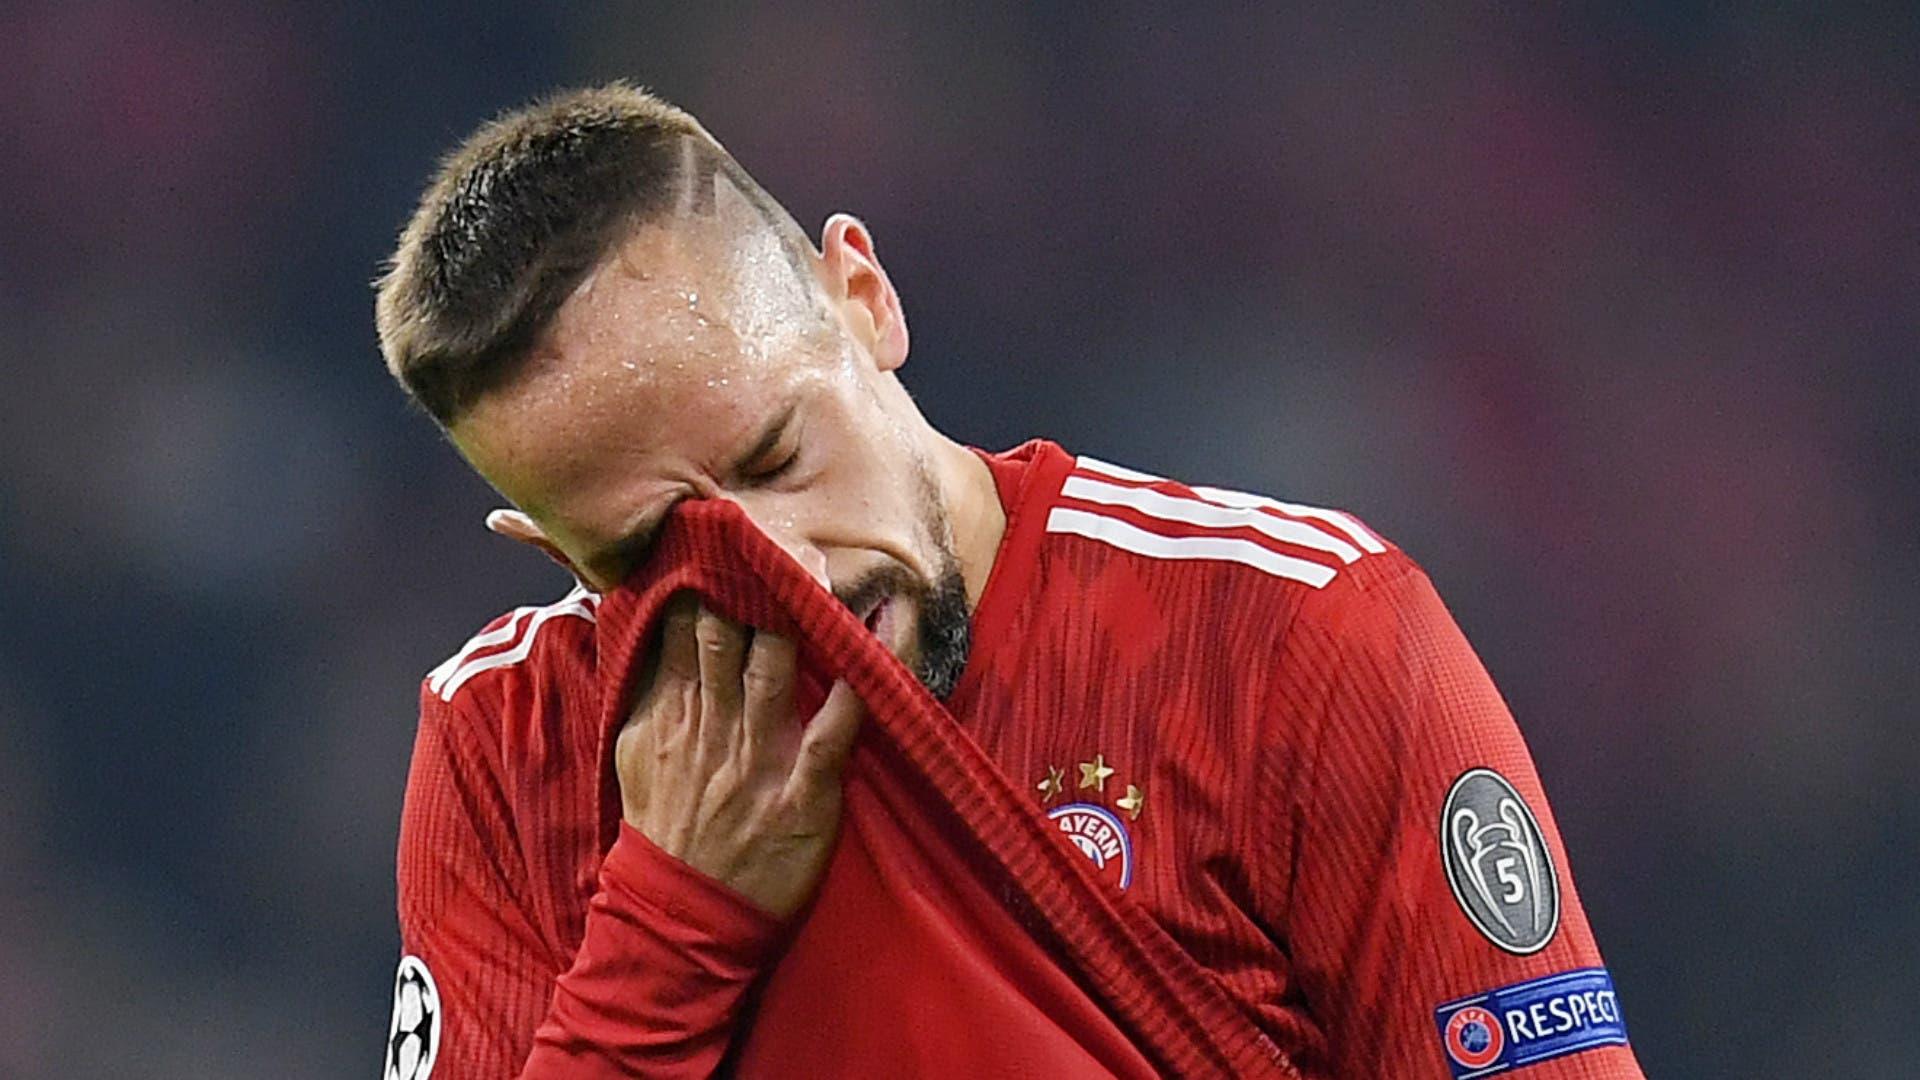 Bayern Munich confirma sanción a Franck Ribéry por insultar a aficionados